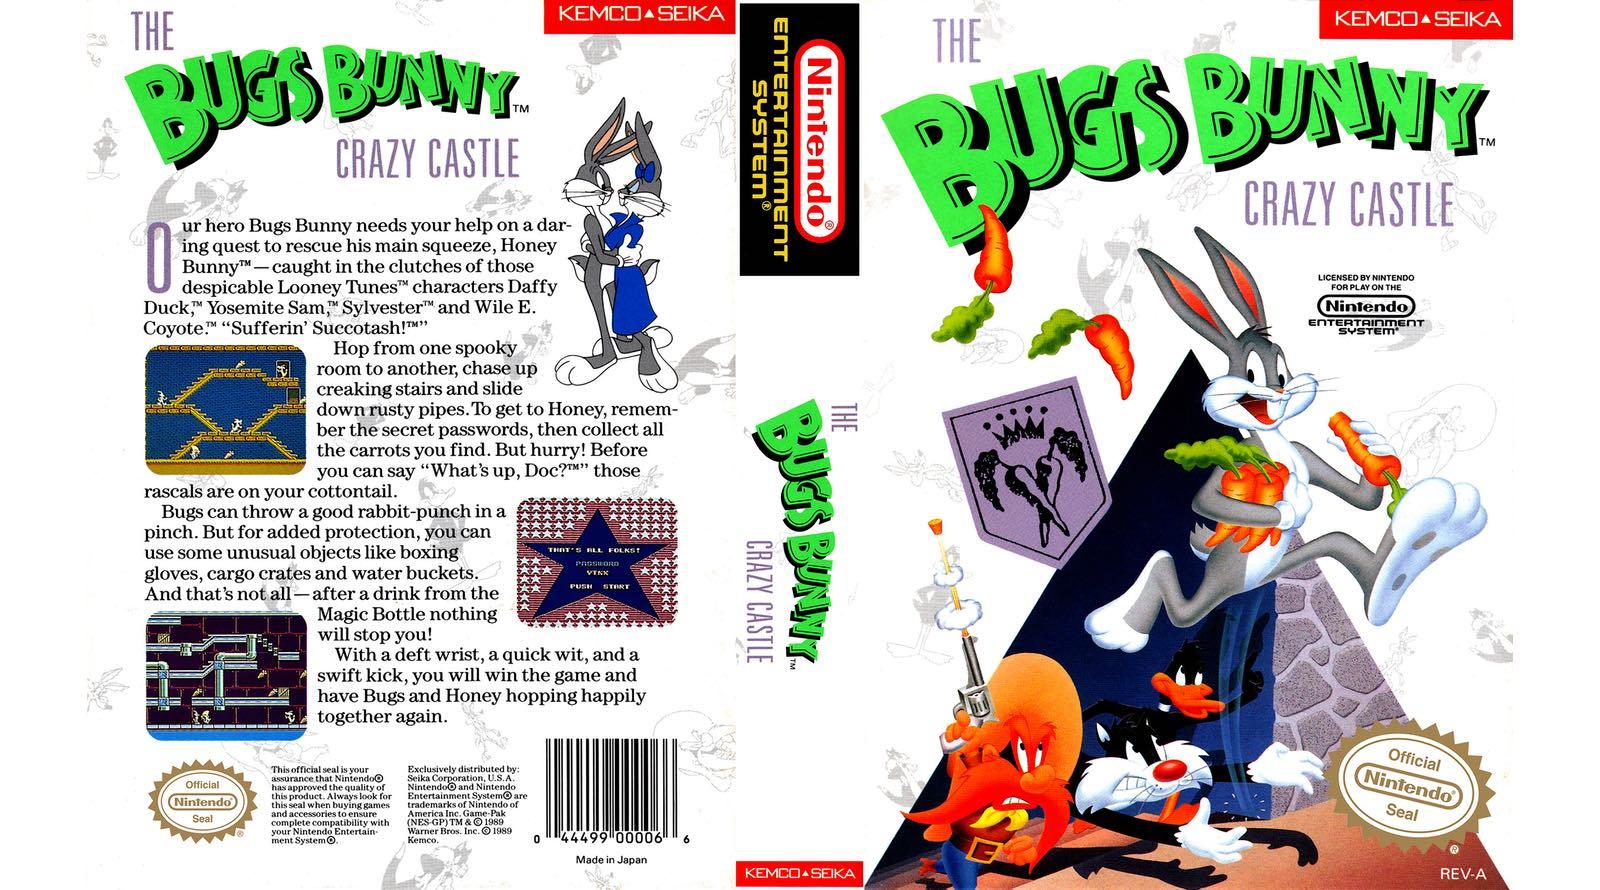 feat-bugs-bunny-crazy-castle